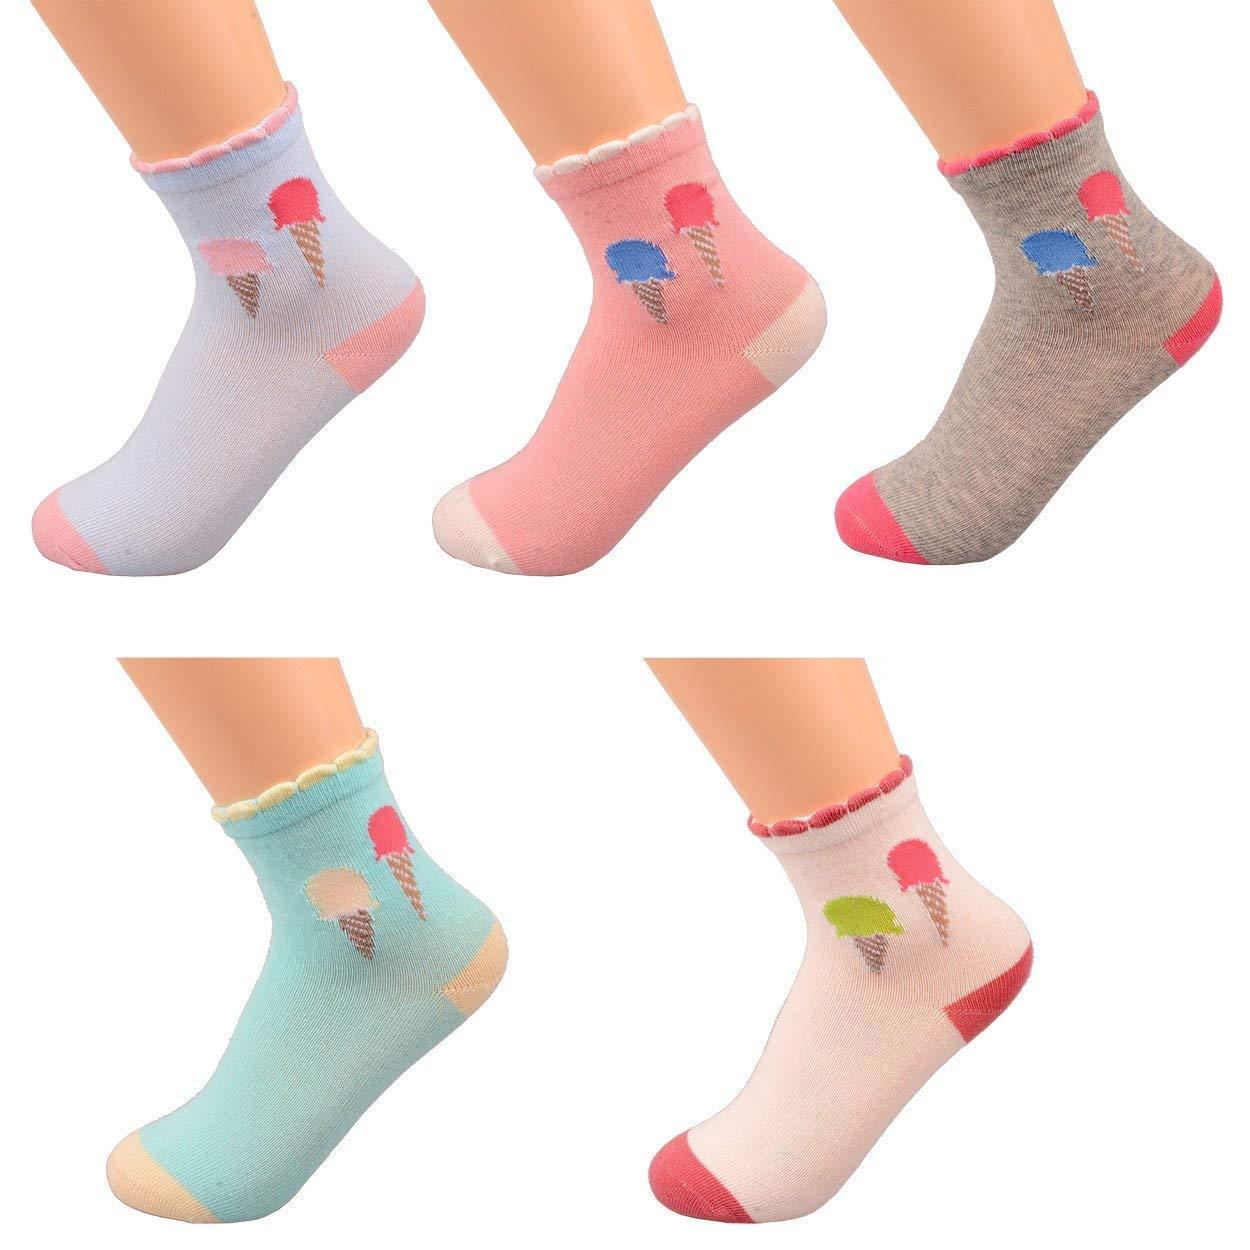 Girls Kids Cute Socks Cartoon Cotton Stockings No Seam Vibrant Icecream style Pack of 5